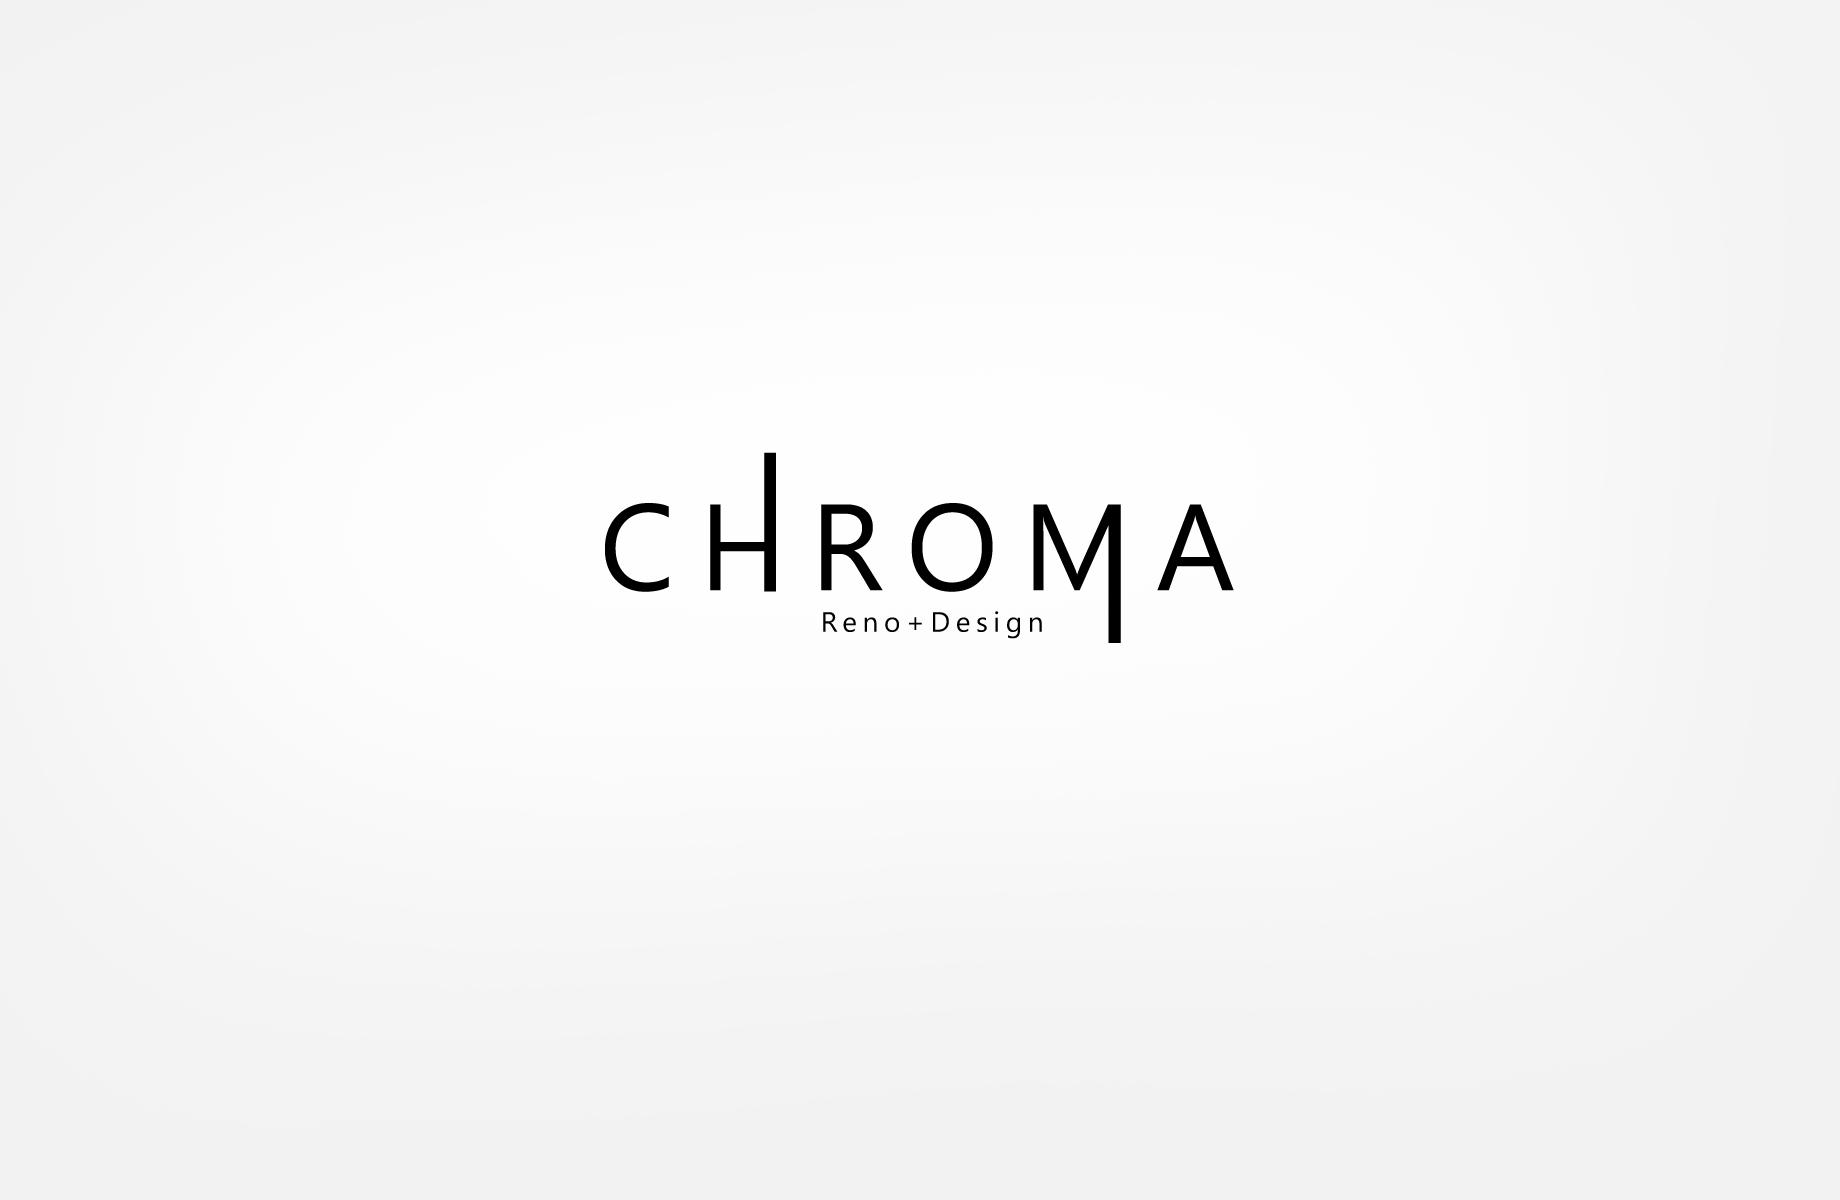 Logo Design by Jan Chua - Entry No. 7 in the Logo Design Contest Inspiring Logo Design for Chroma Reno+Design.